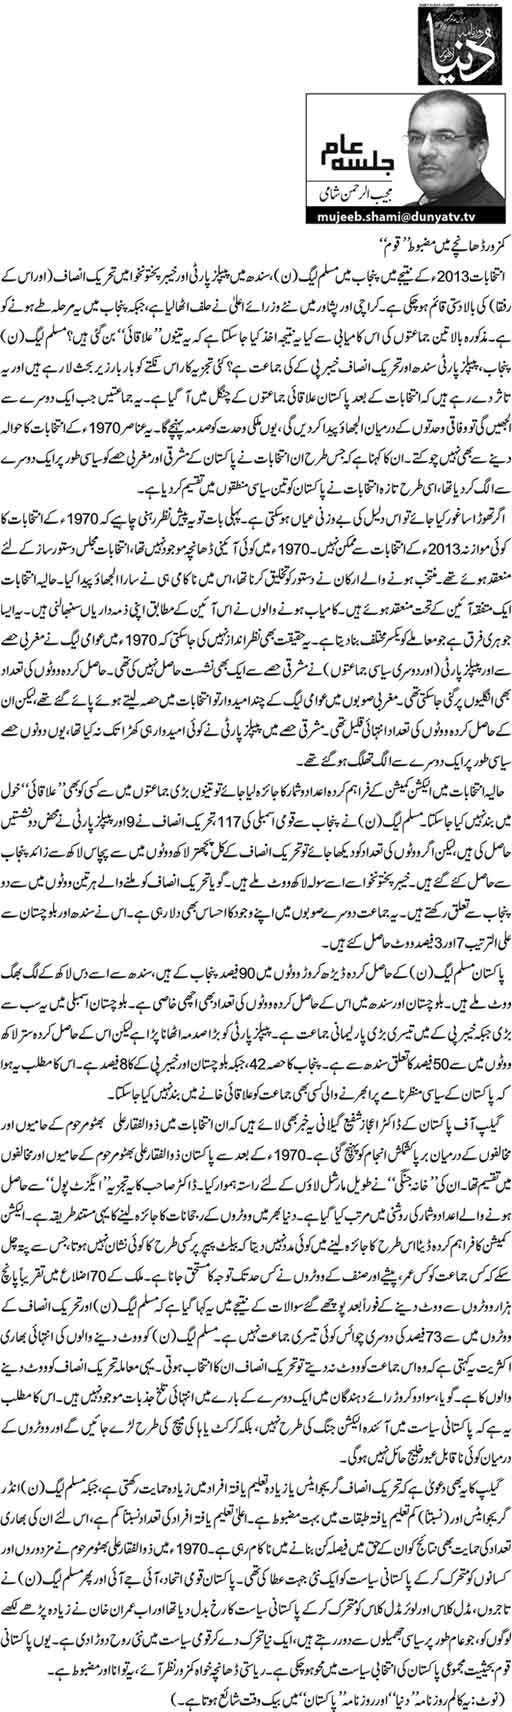 "Kamzor Dhanchay Main Mazboot ""Qaum"" - Mujeeb ur Rehman Shami"